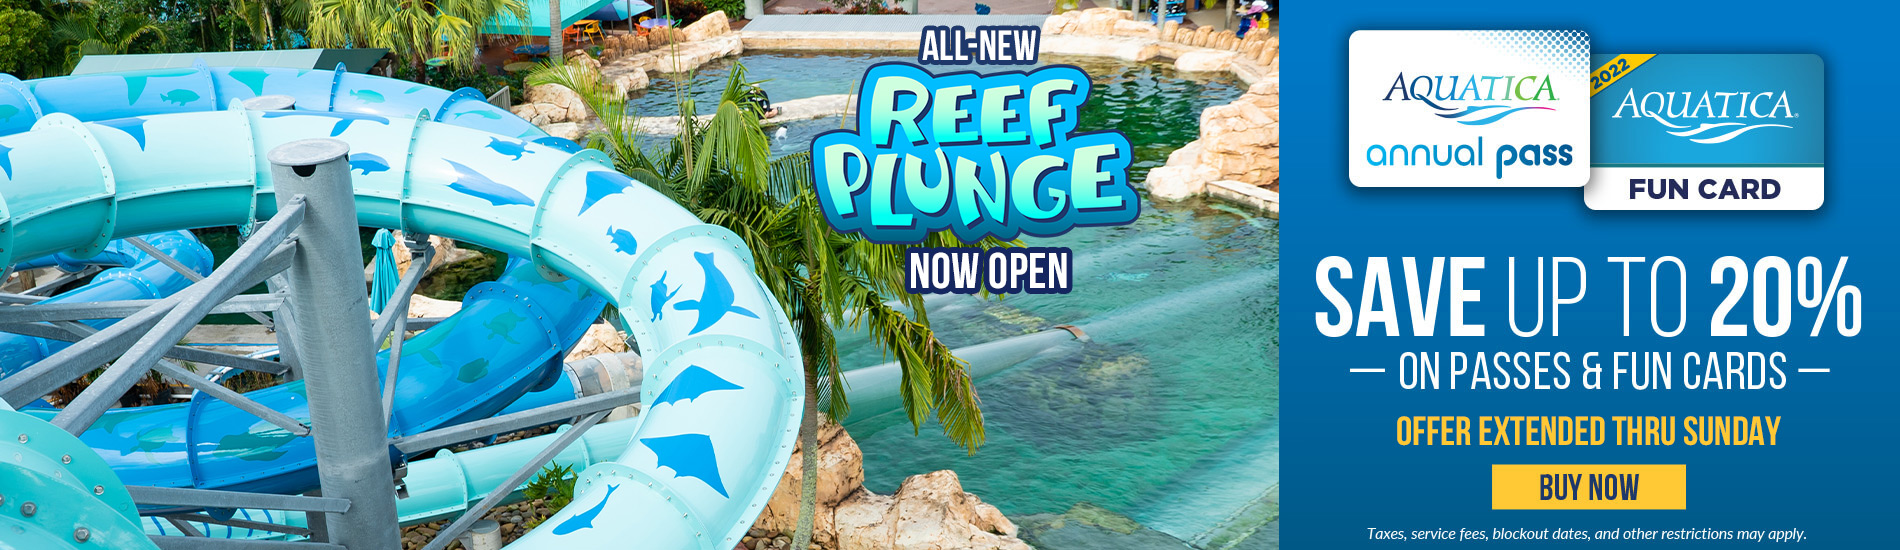 Aquatica Orlando Save 20% on Passes and Fun Cards